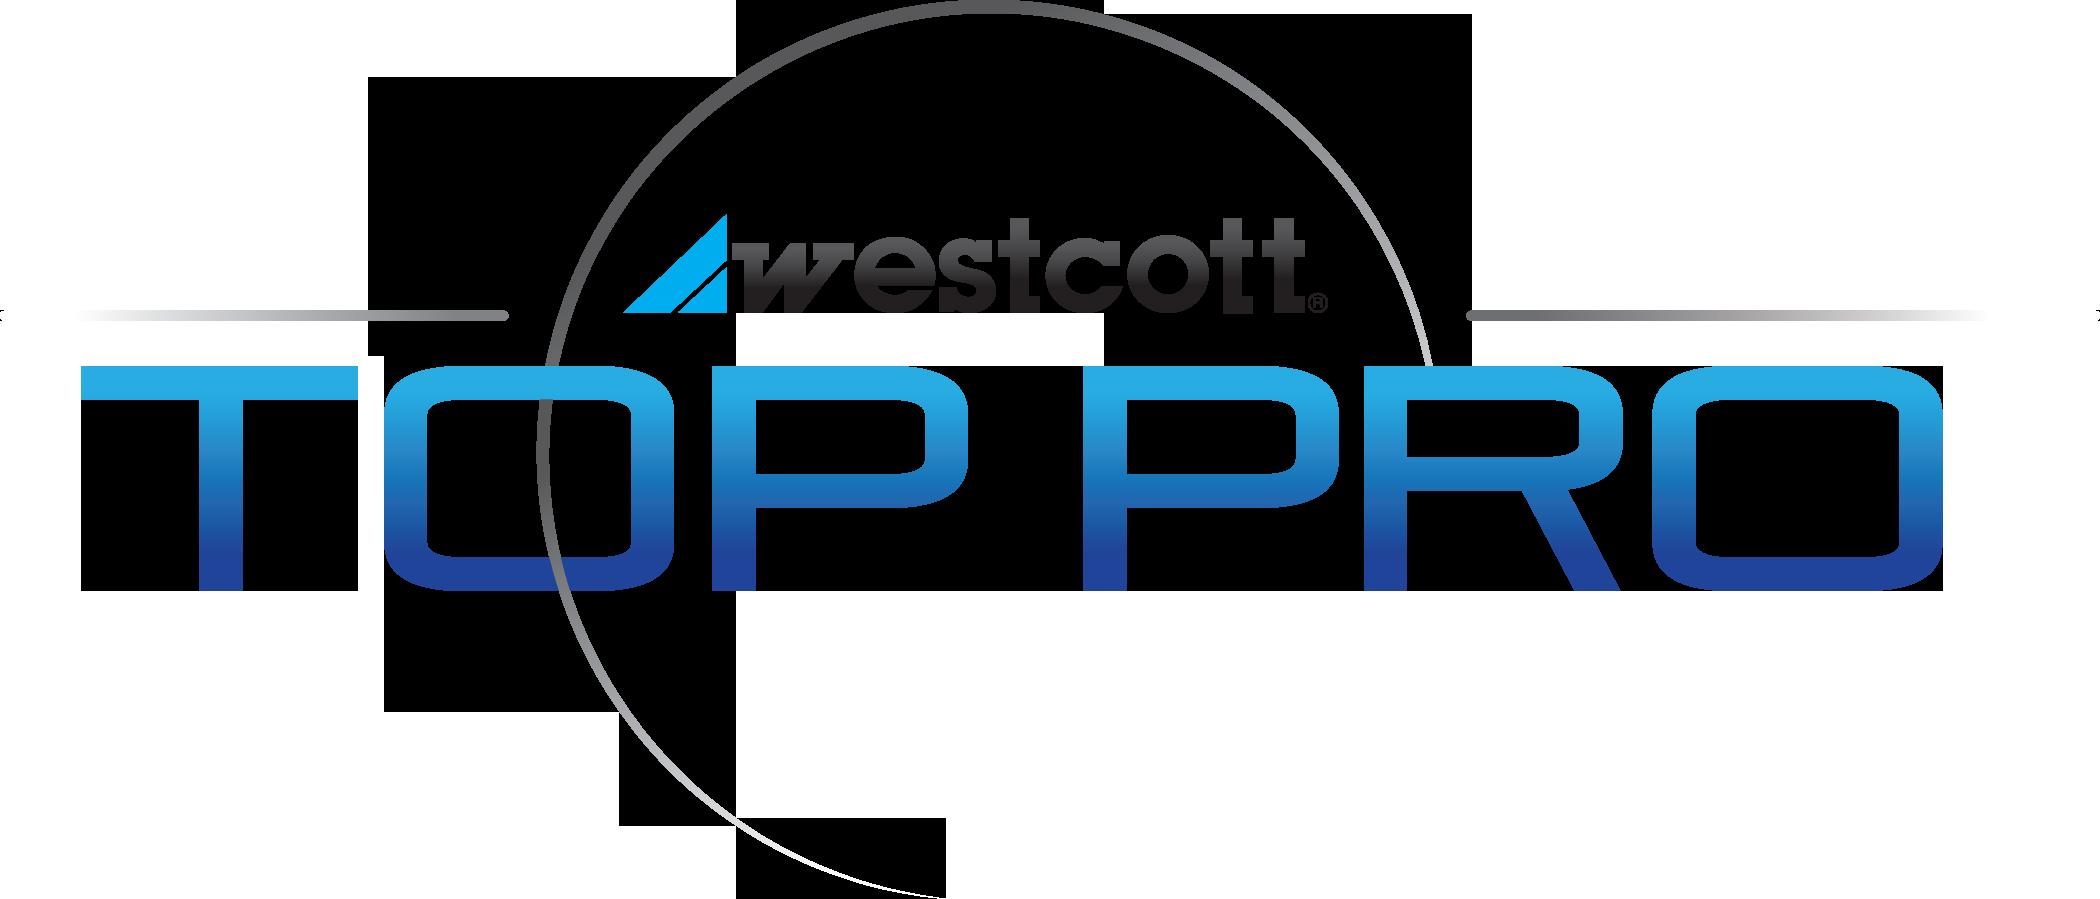 Westcott Top Pro Photographer